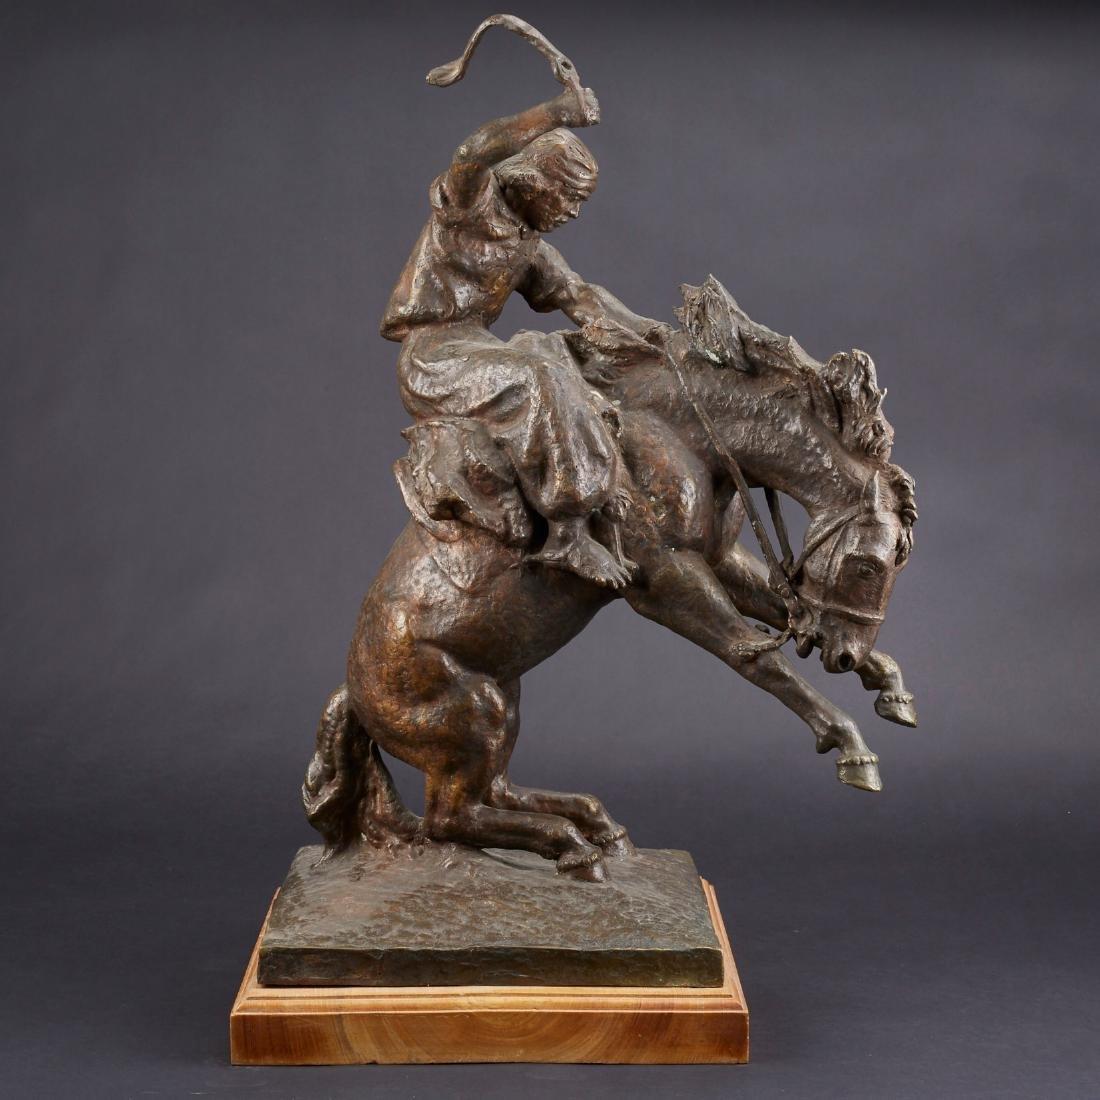 Jose Belloni Jineteando Bronze Sculpture